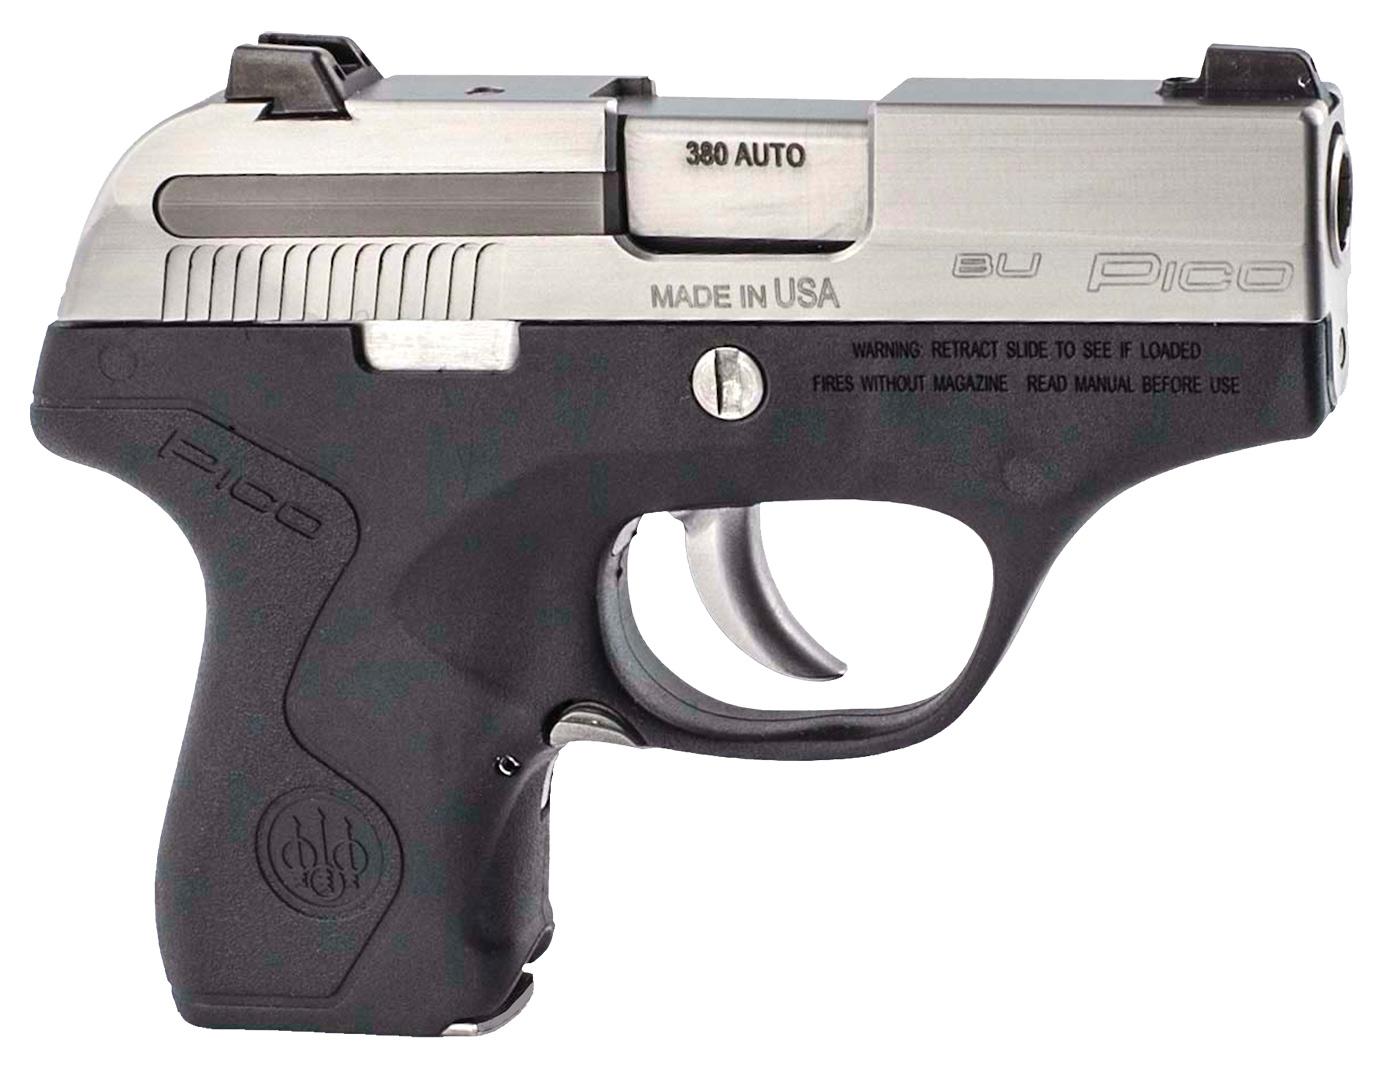 The Top 15 Smallest Pistols